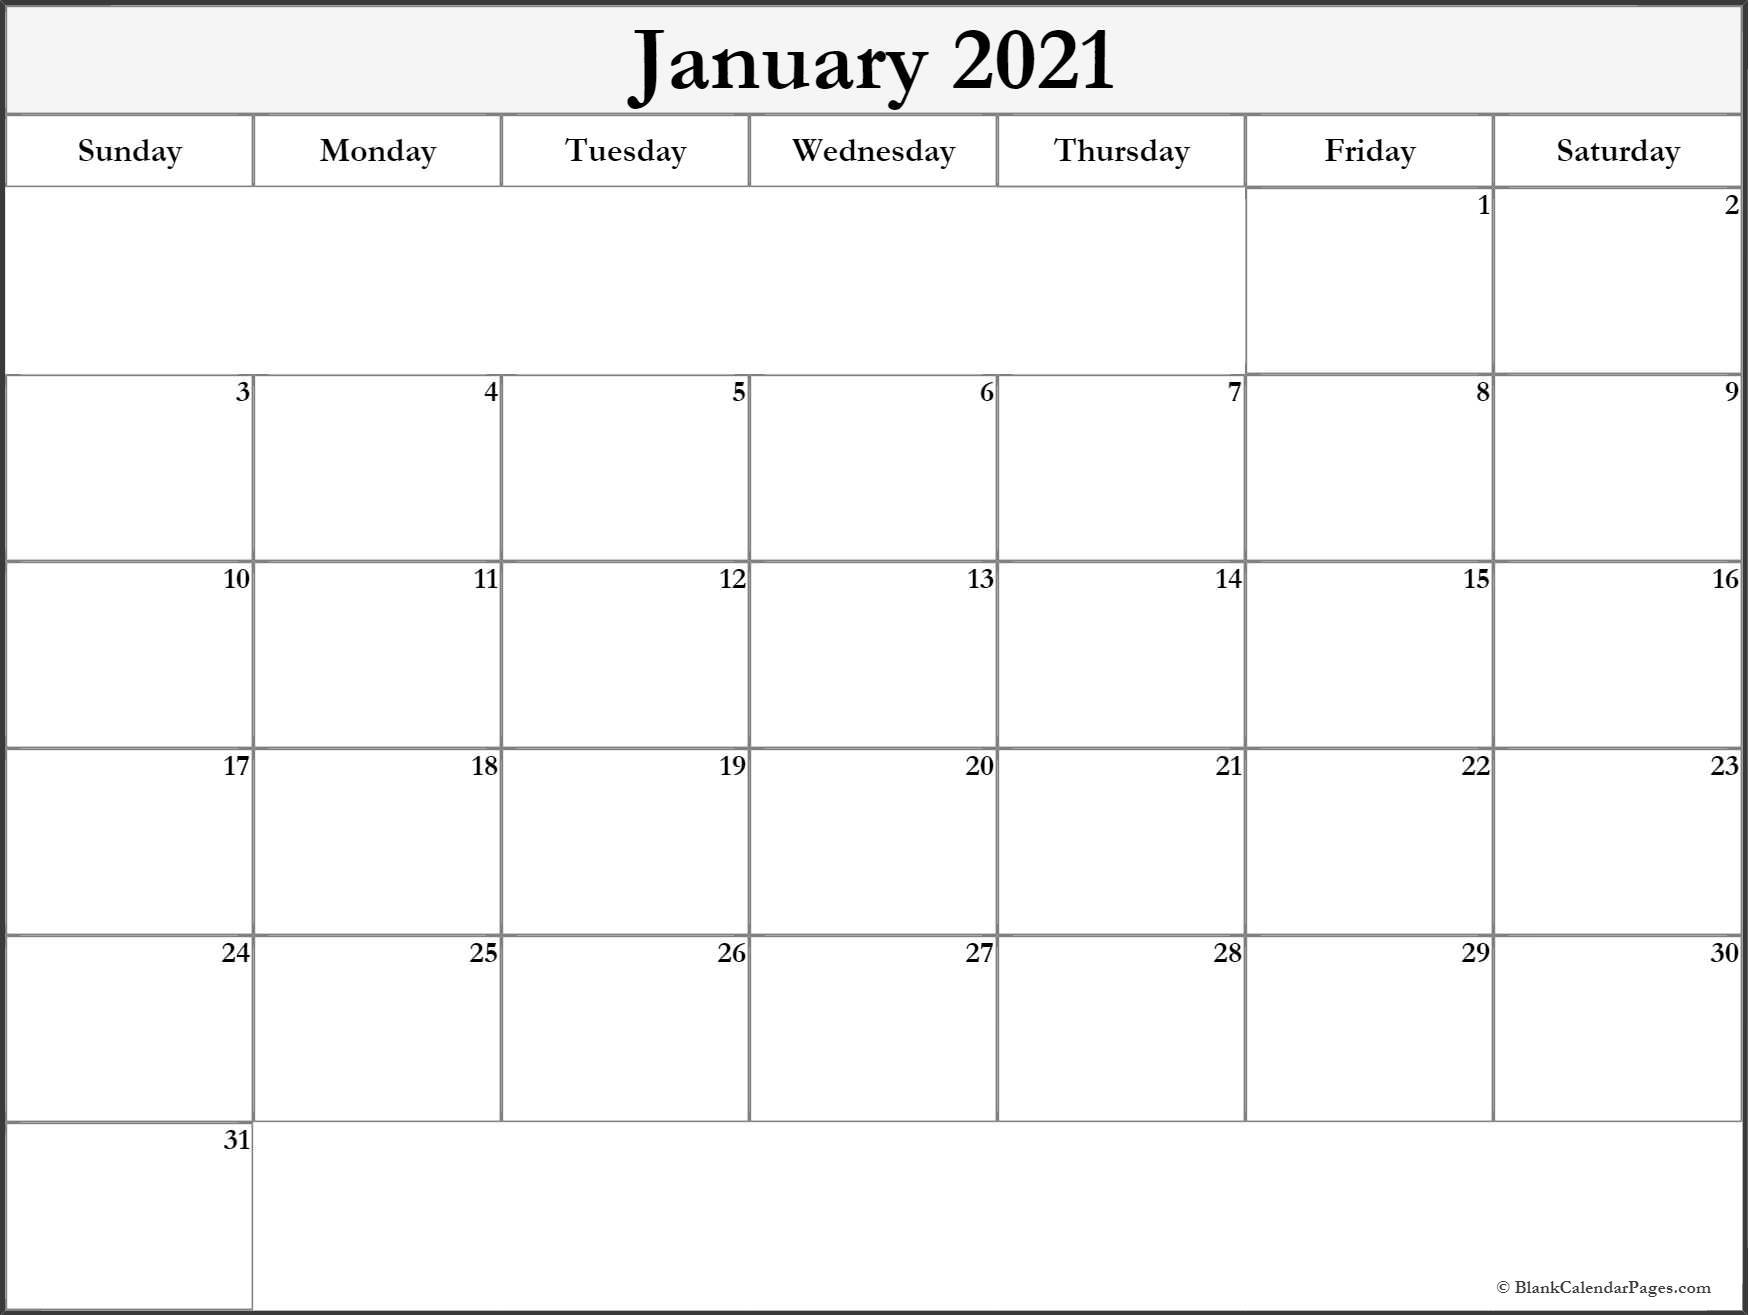 January 2021 Blank Calendar Collection 6